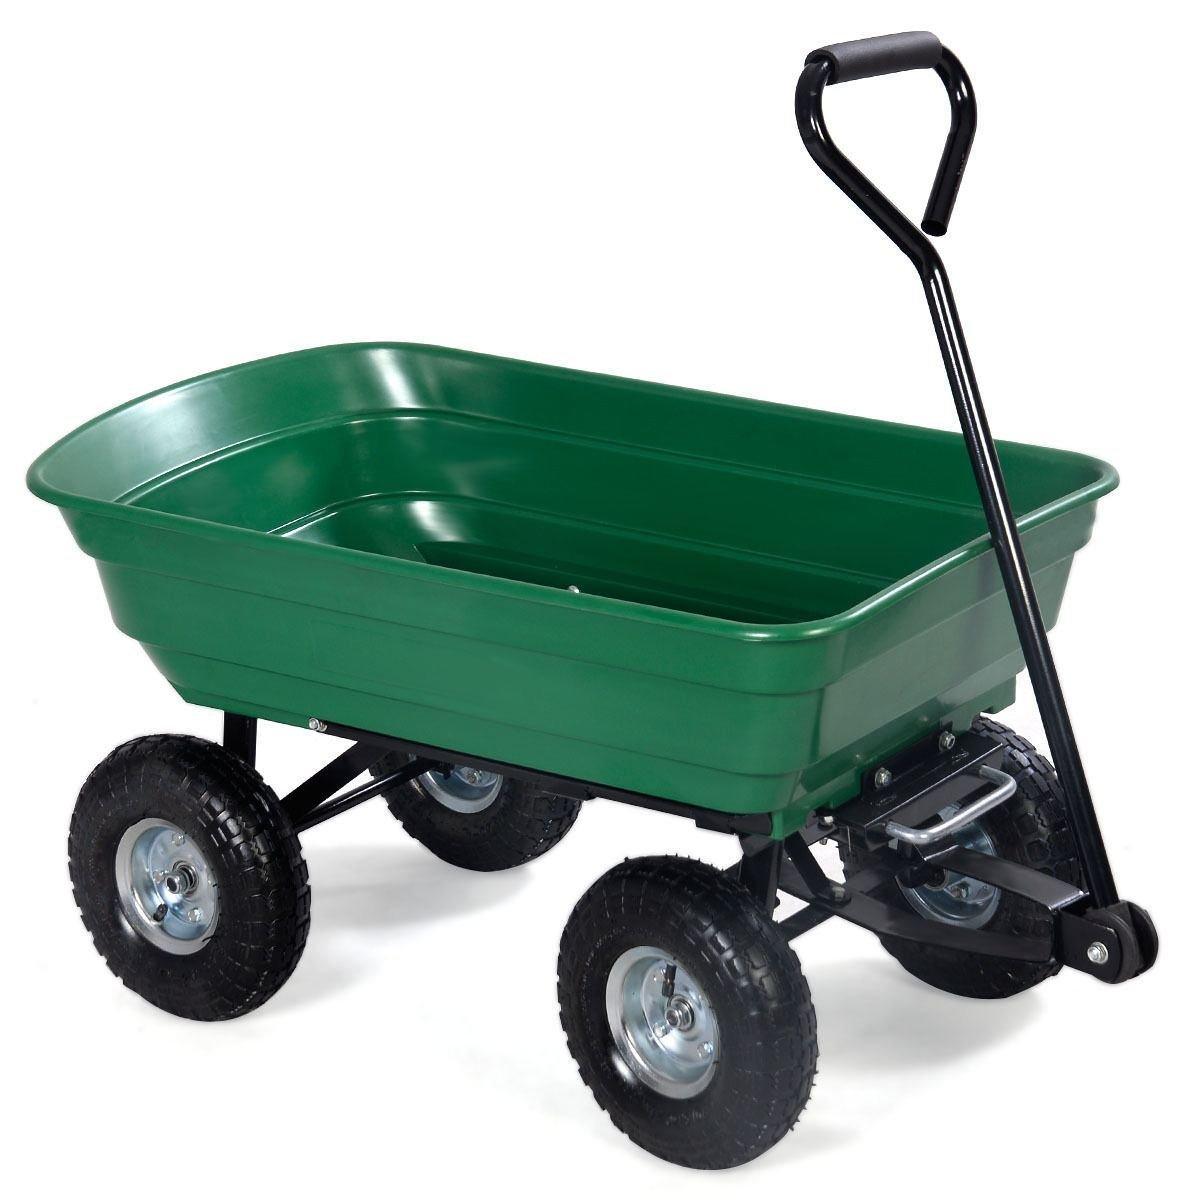 Garden Carts 650 Lb Dump Cart Dumper Wagon Carrier Wheel Barrow Air Tires  (Standard Size): Amazon.in: Home Improvement